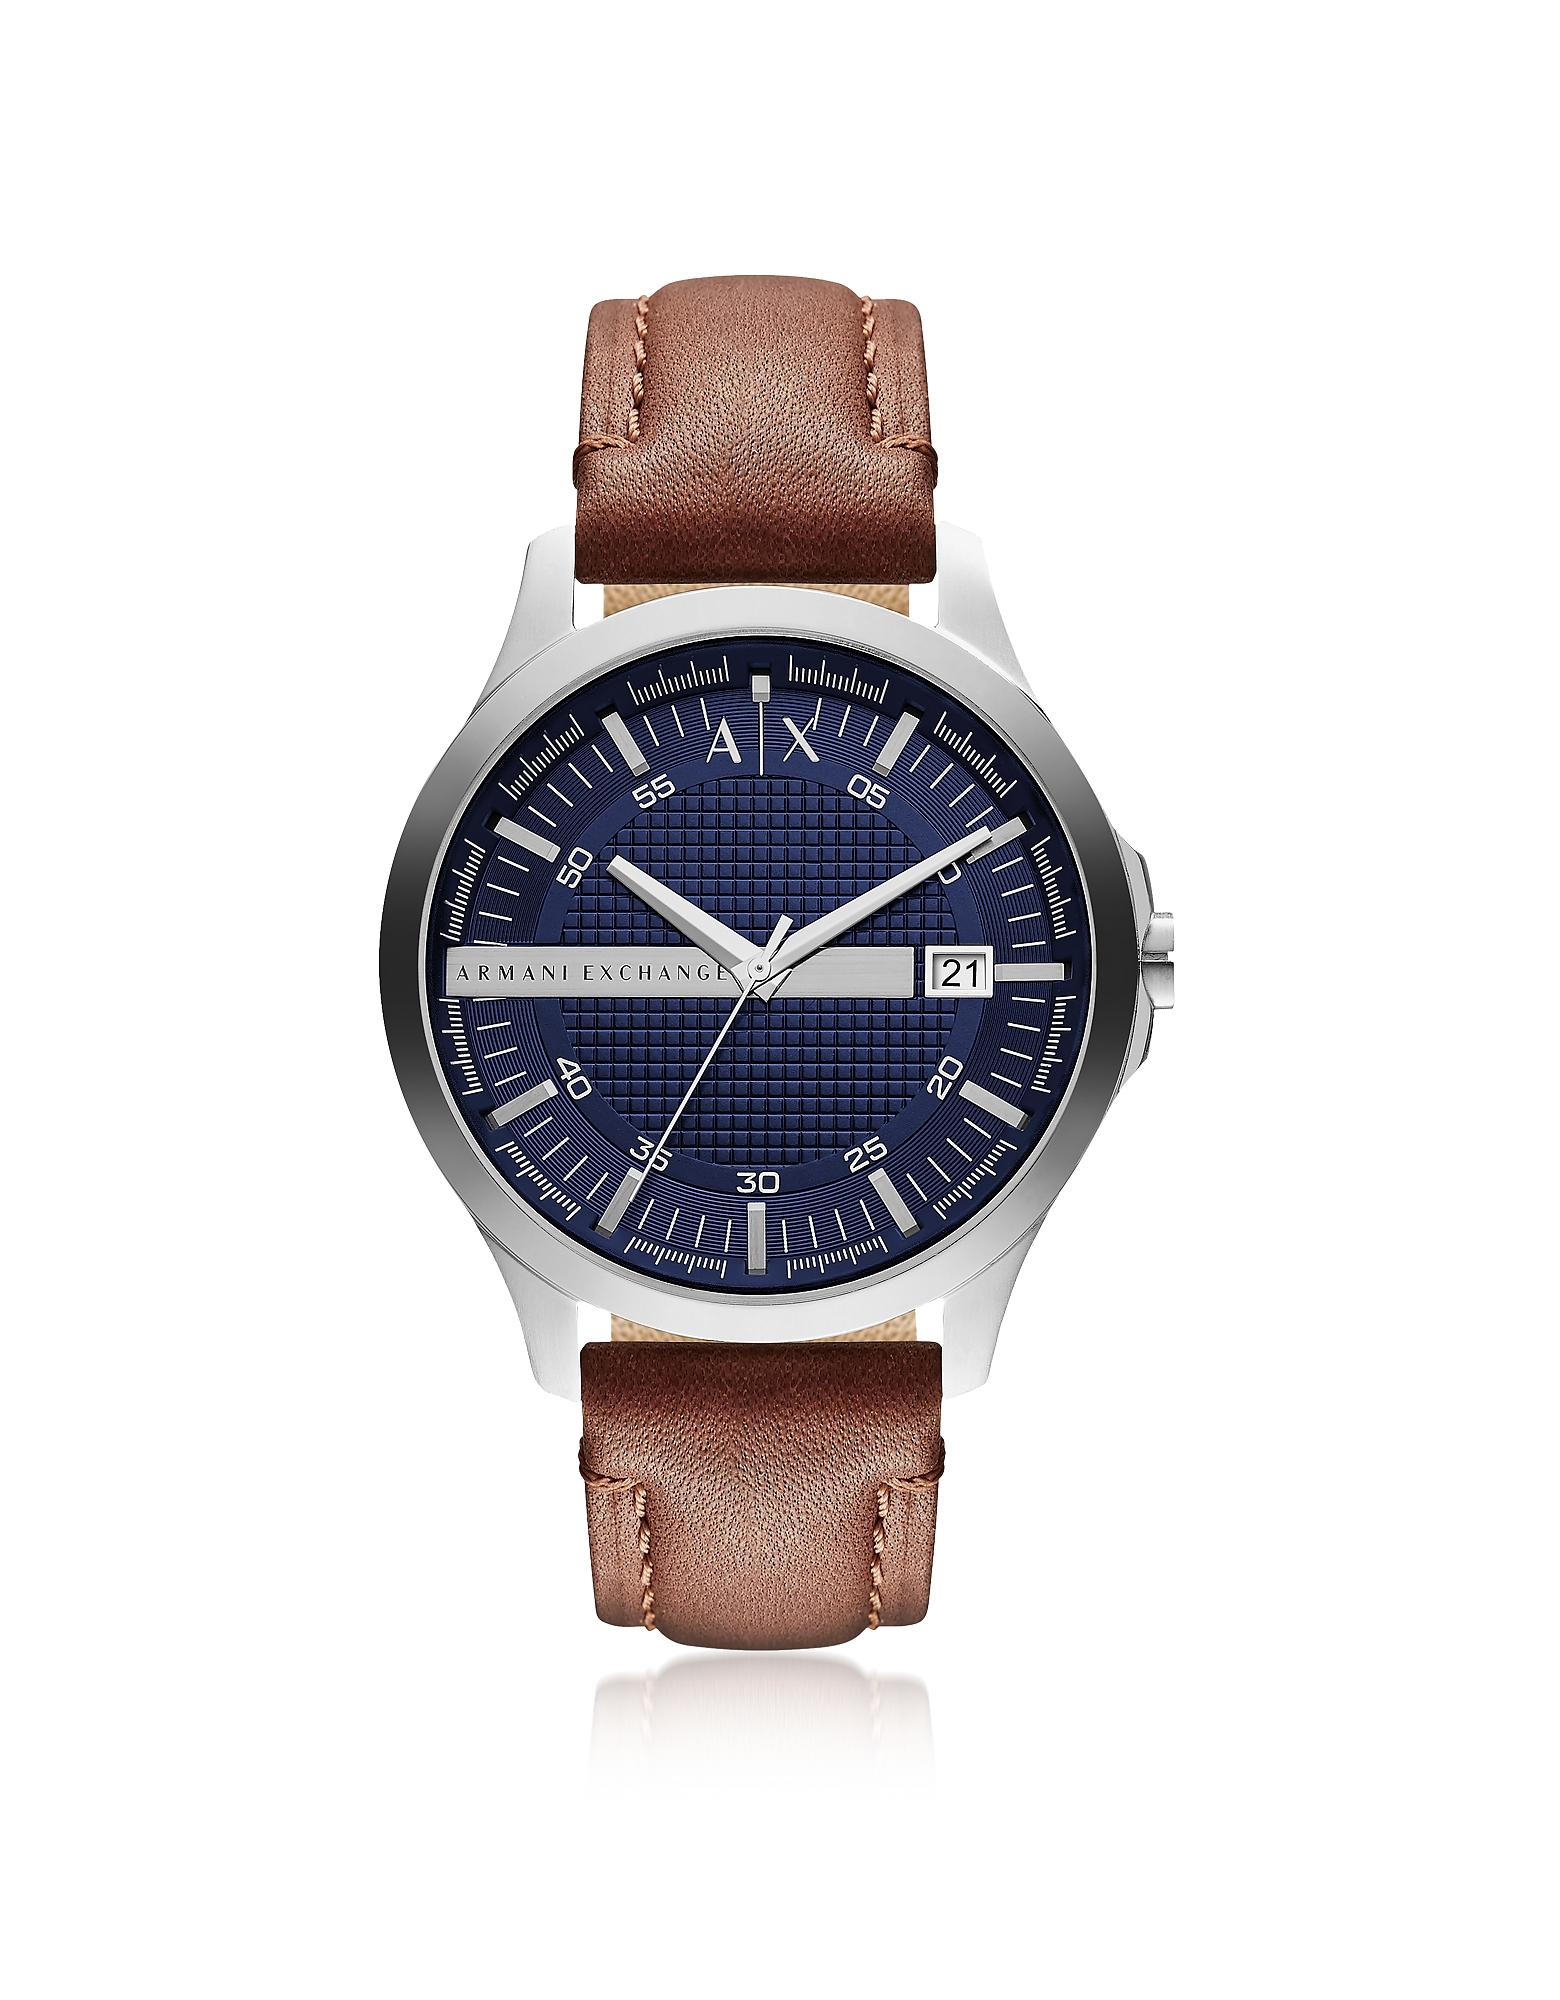 Armani Exchange Men's Watches, Hampton Brown Leather Men's Watch